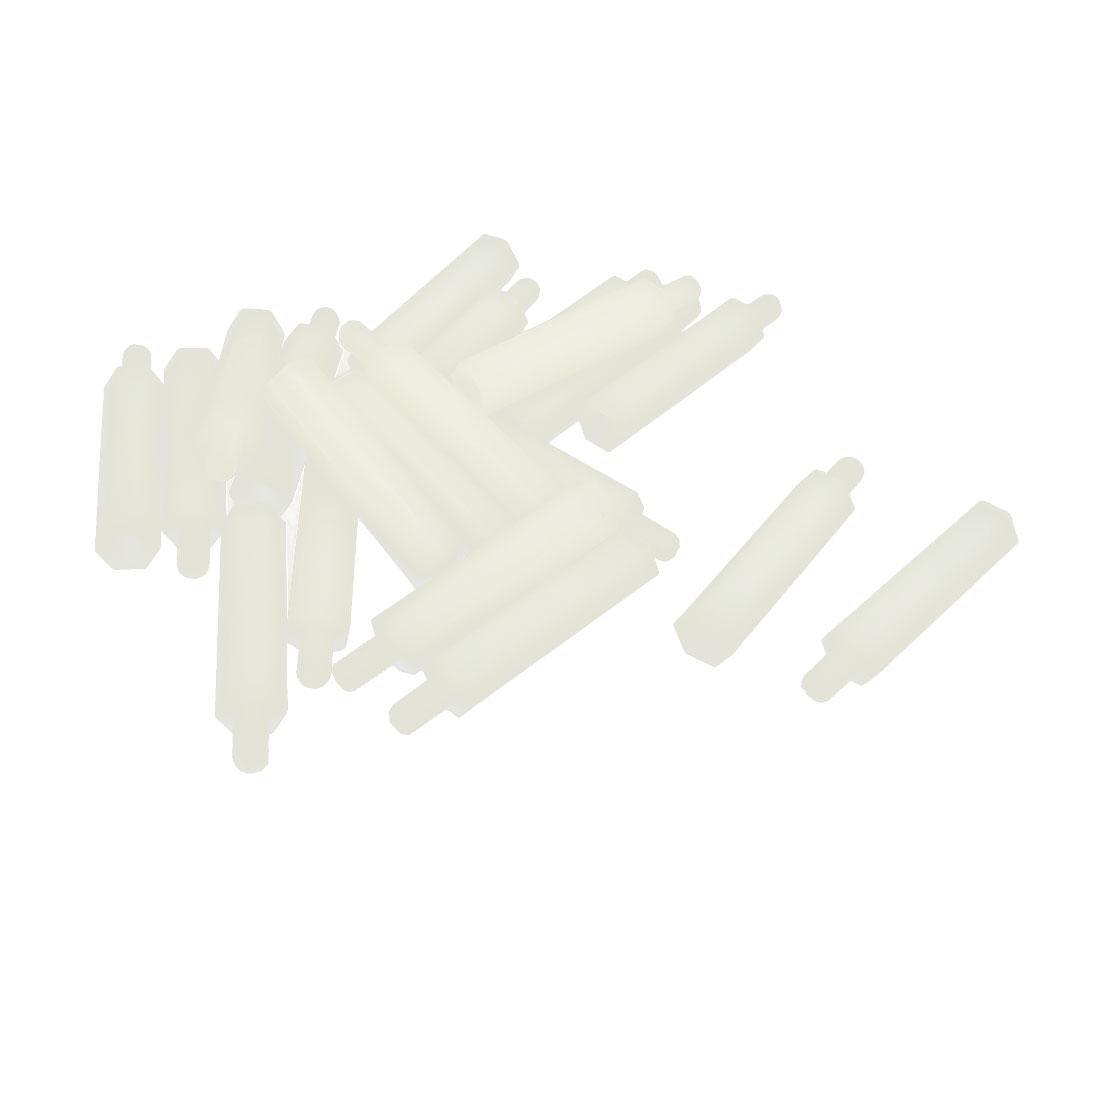 20pcs M3 25+6mm Male Female Thread Beige Nylon Hex Hexagonal Nut Standoff Screw Spacer Pillar